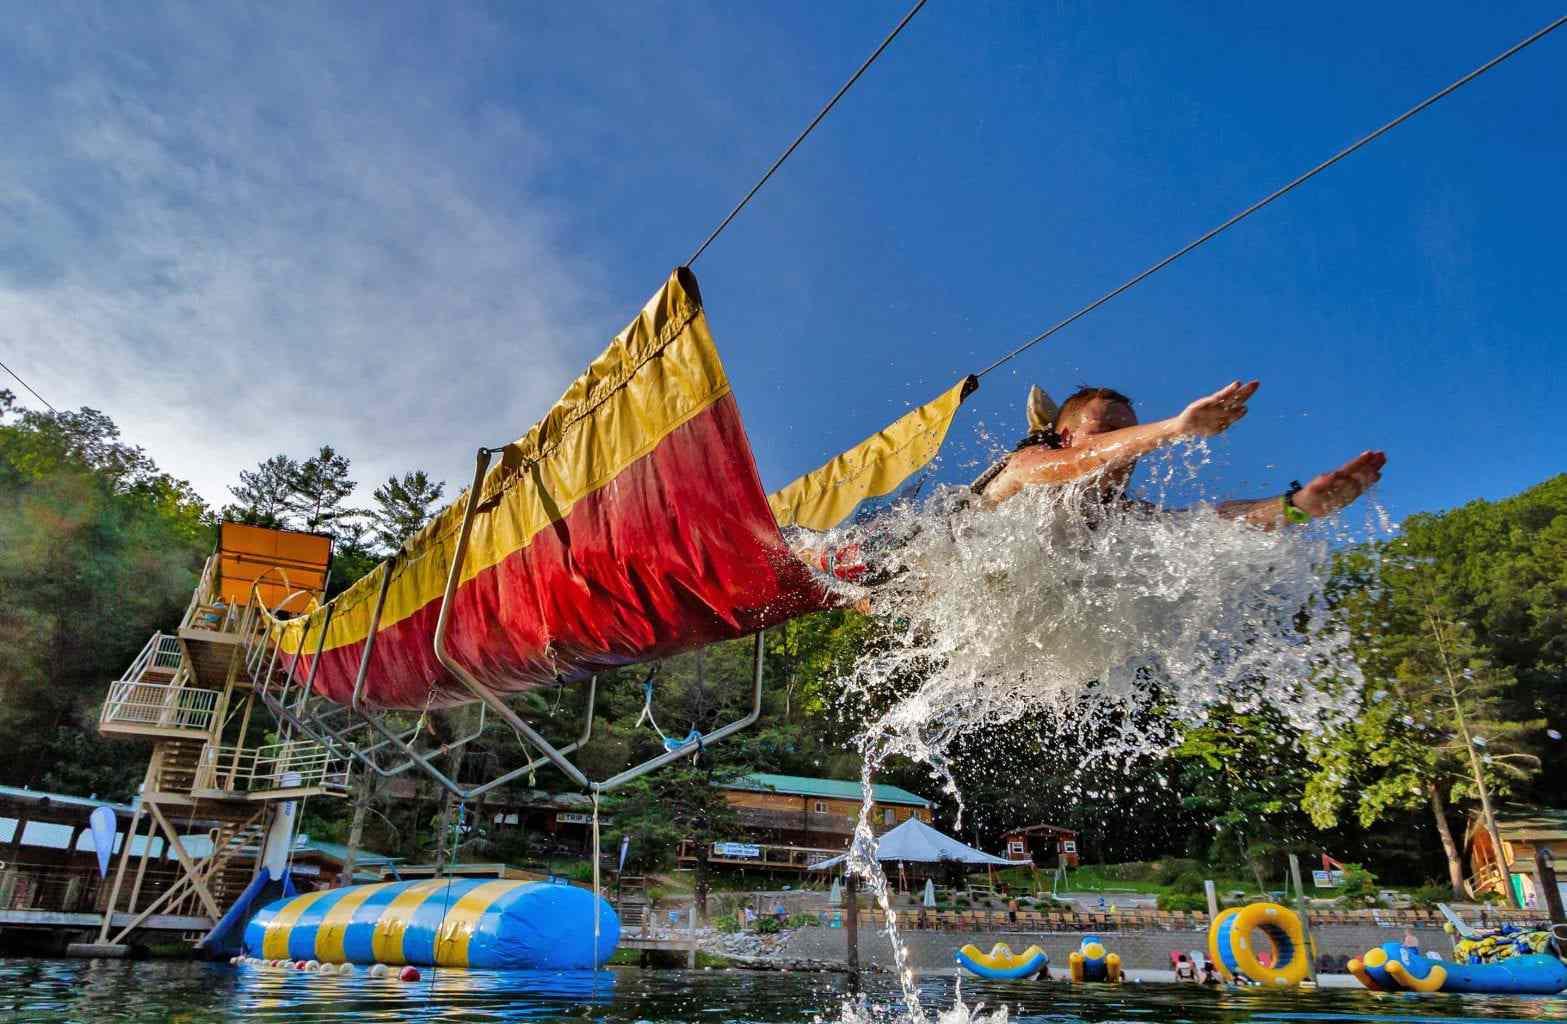 Wonderland Waterpark Ace Adventure Resort West Virginia